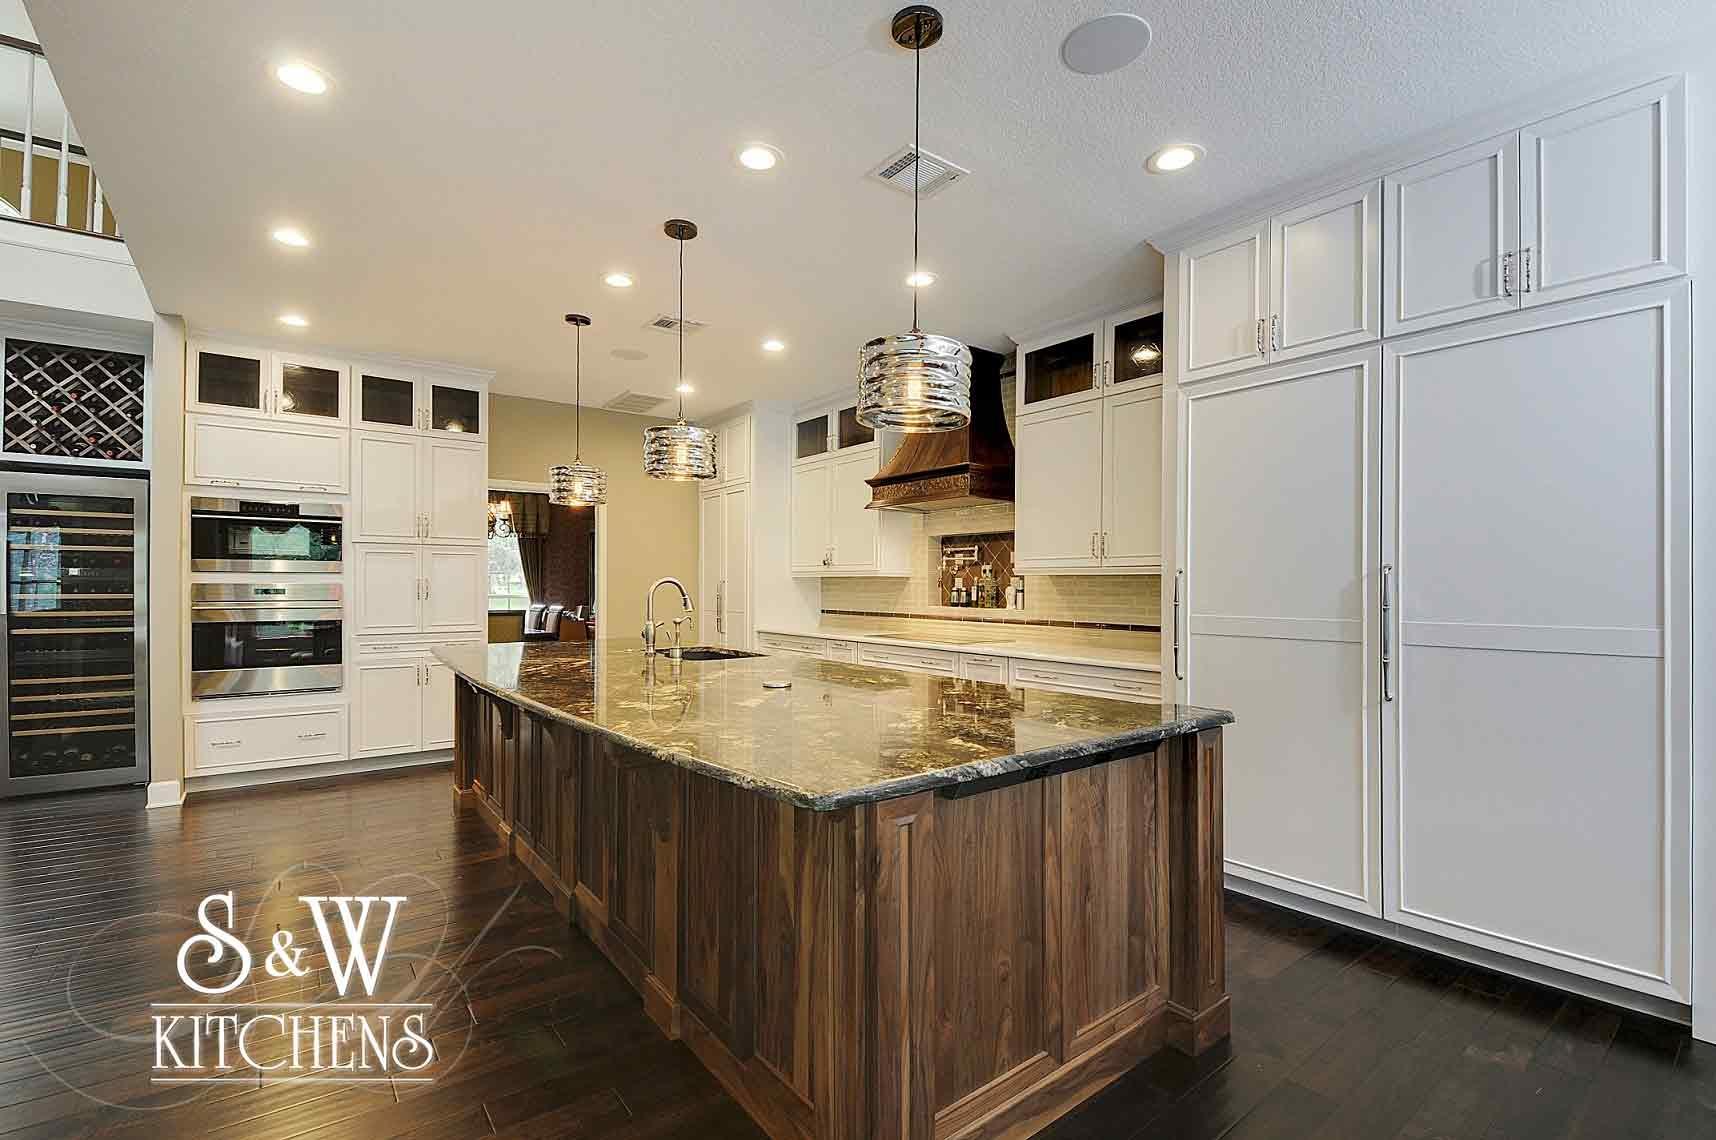 S&W Kitchens image 2